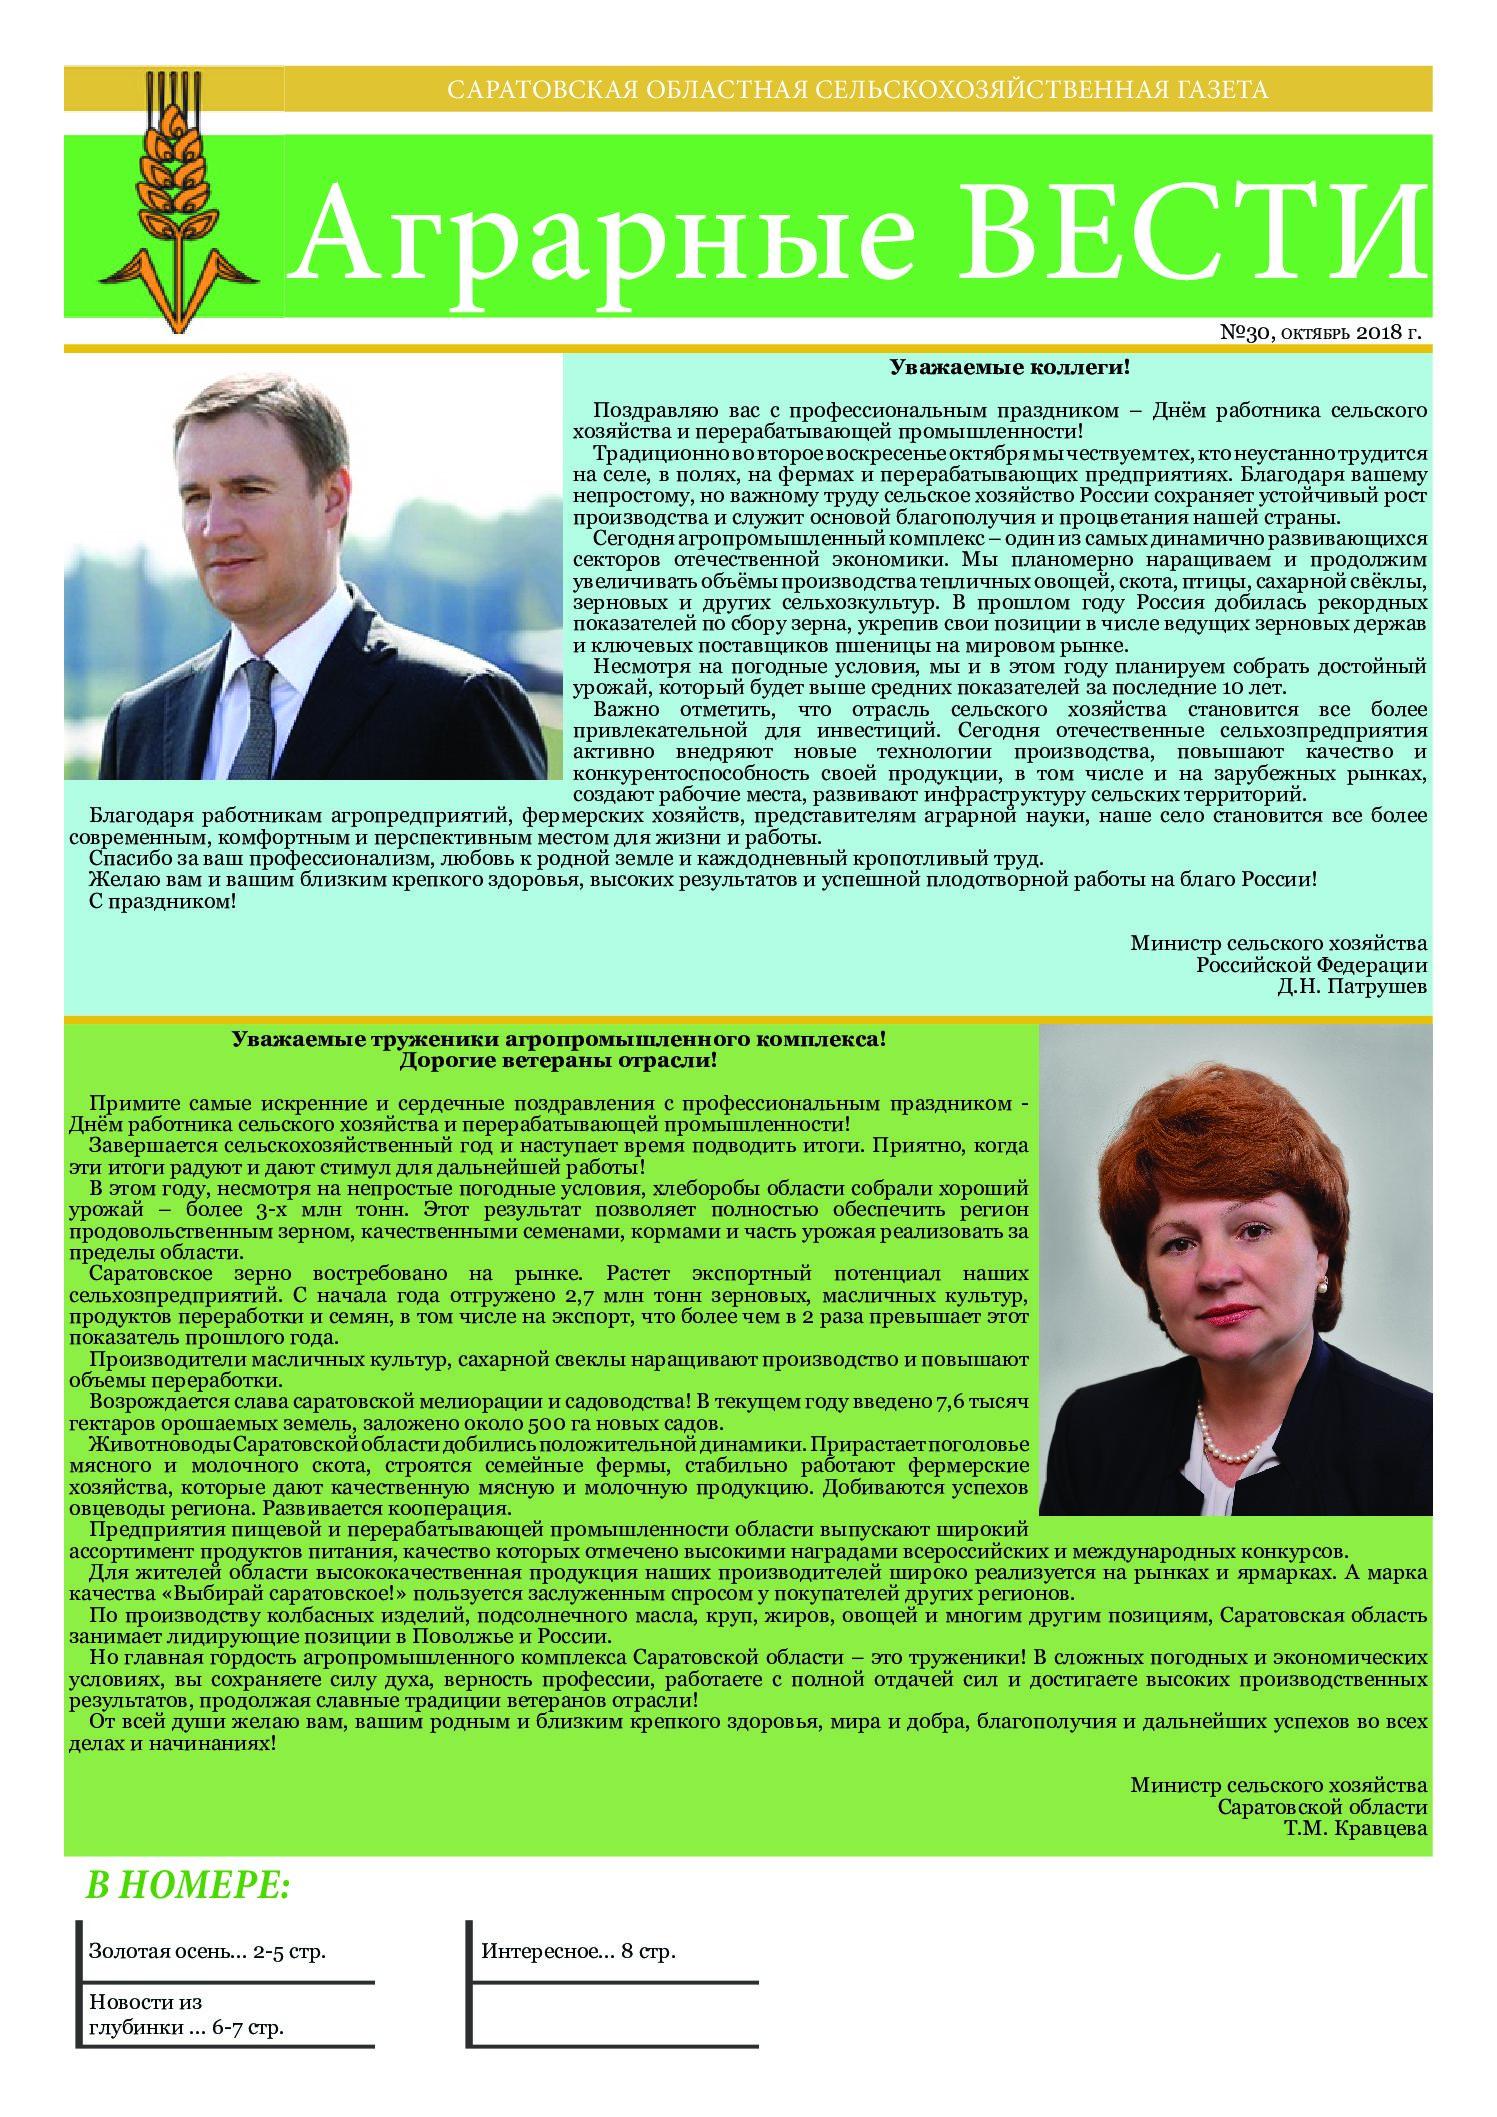 https://saratovagro.ru/wp-content/uploads/2020/08/9.2018-pdf.jpg